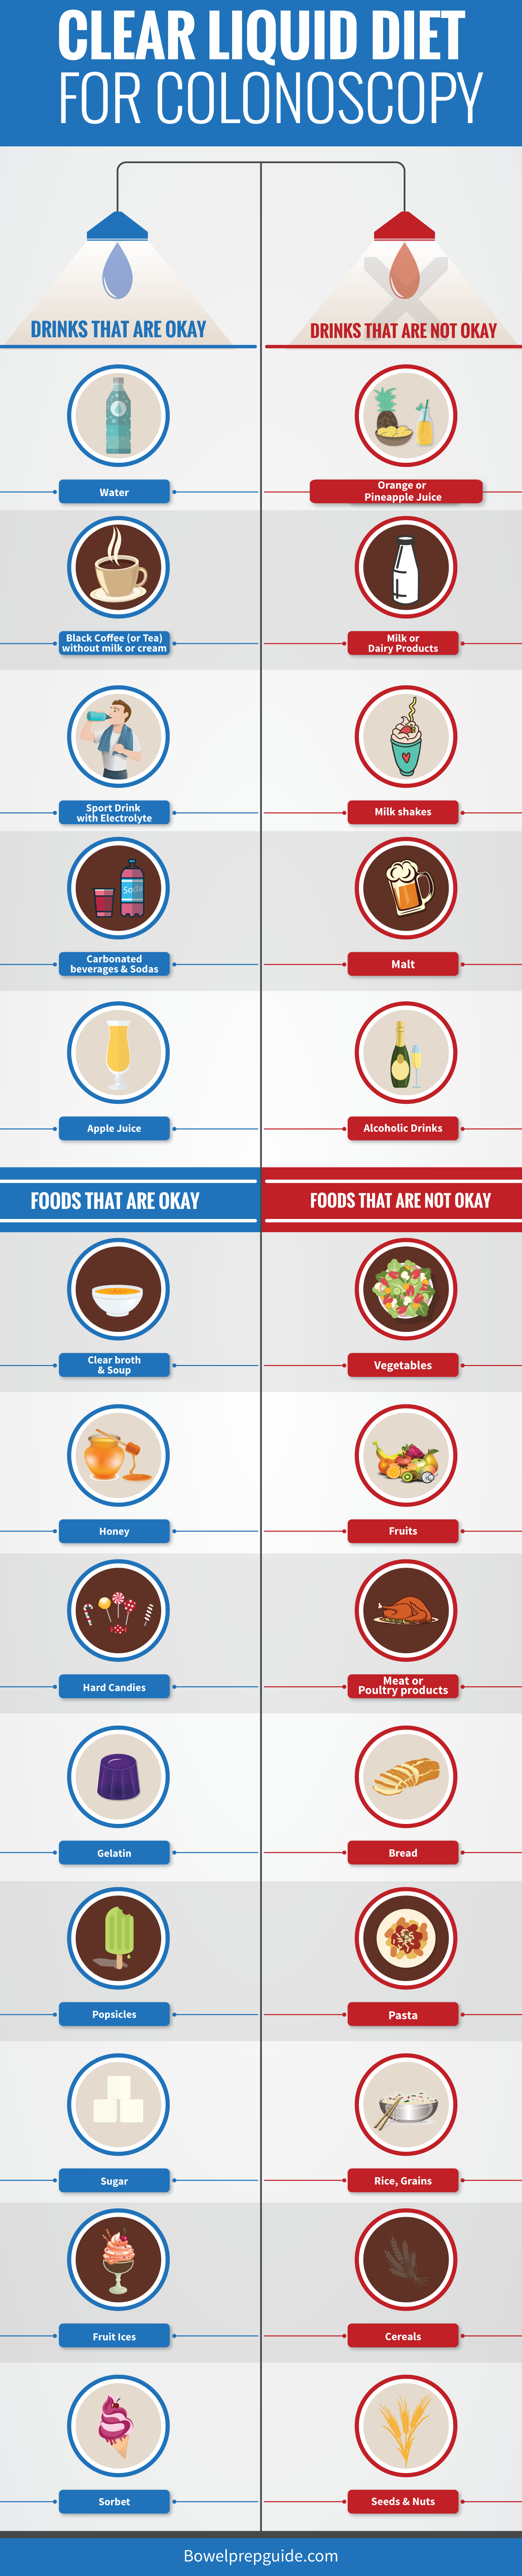 Clear liquid diet for colonoscopy Clear liquid diet